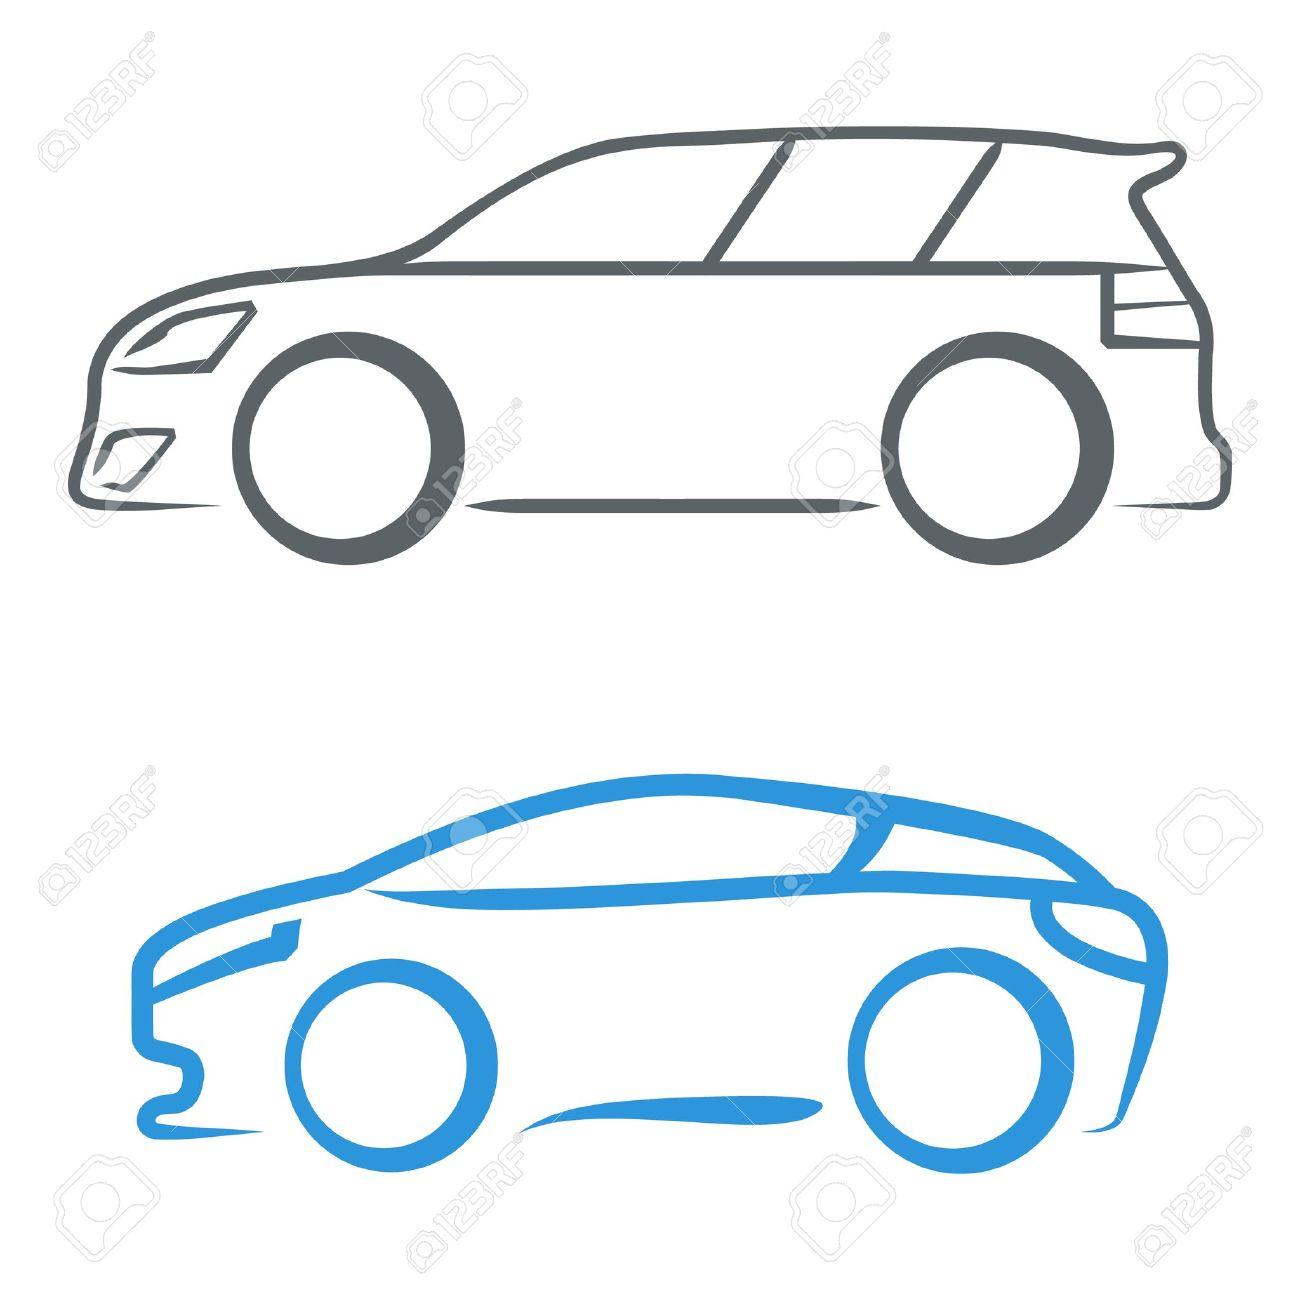 Sports Car Sign Symbol Royalty Free Cliparts Vectors And Stock